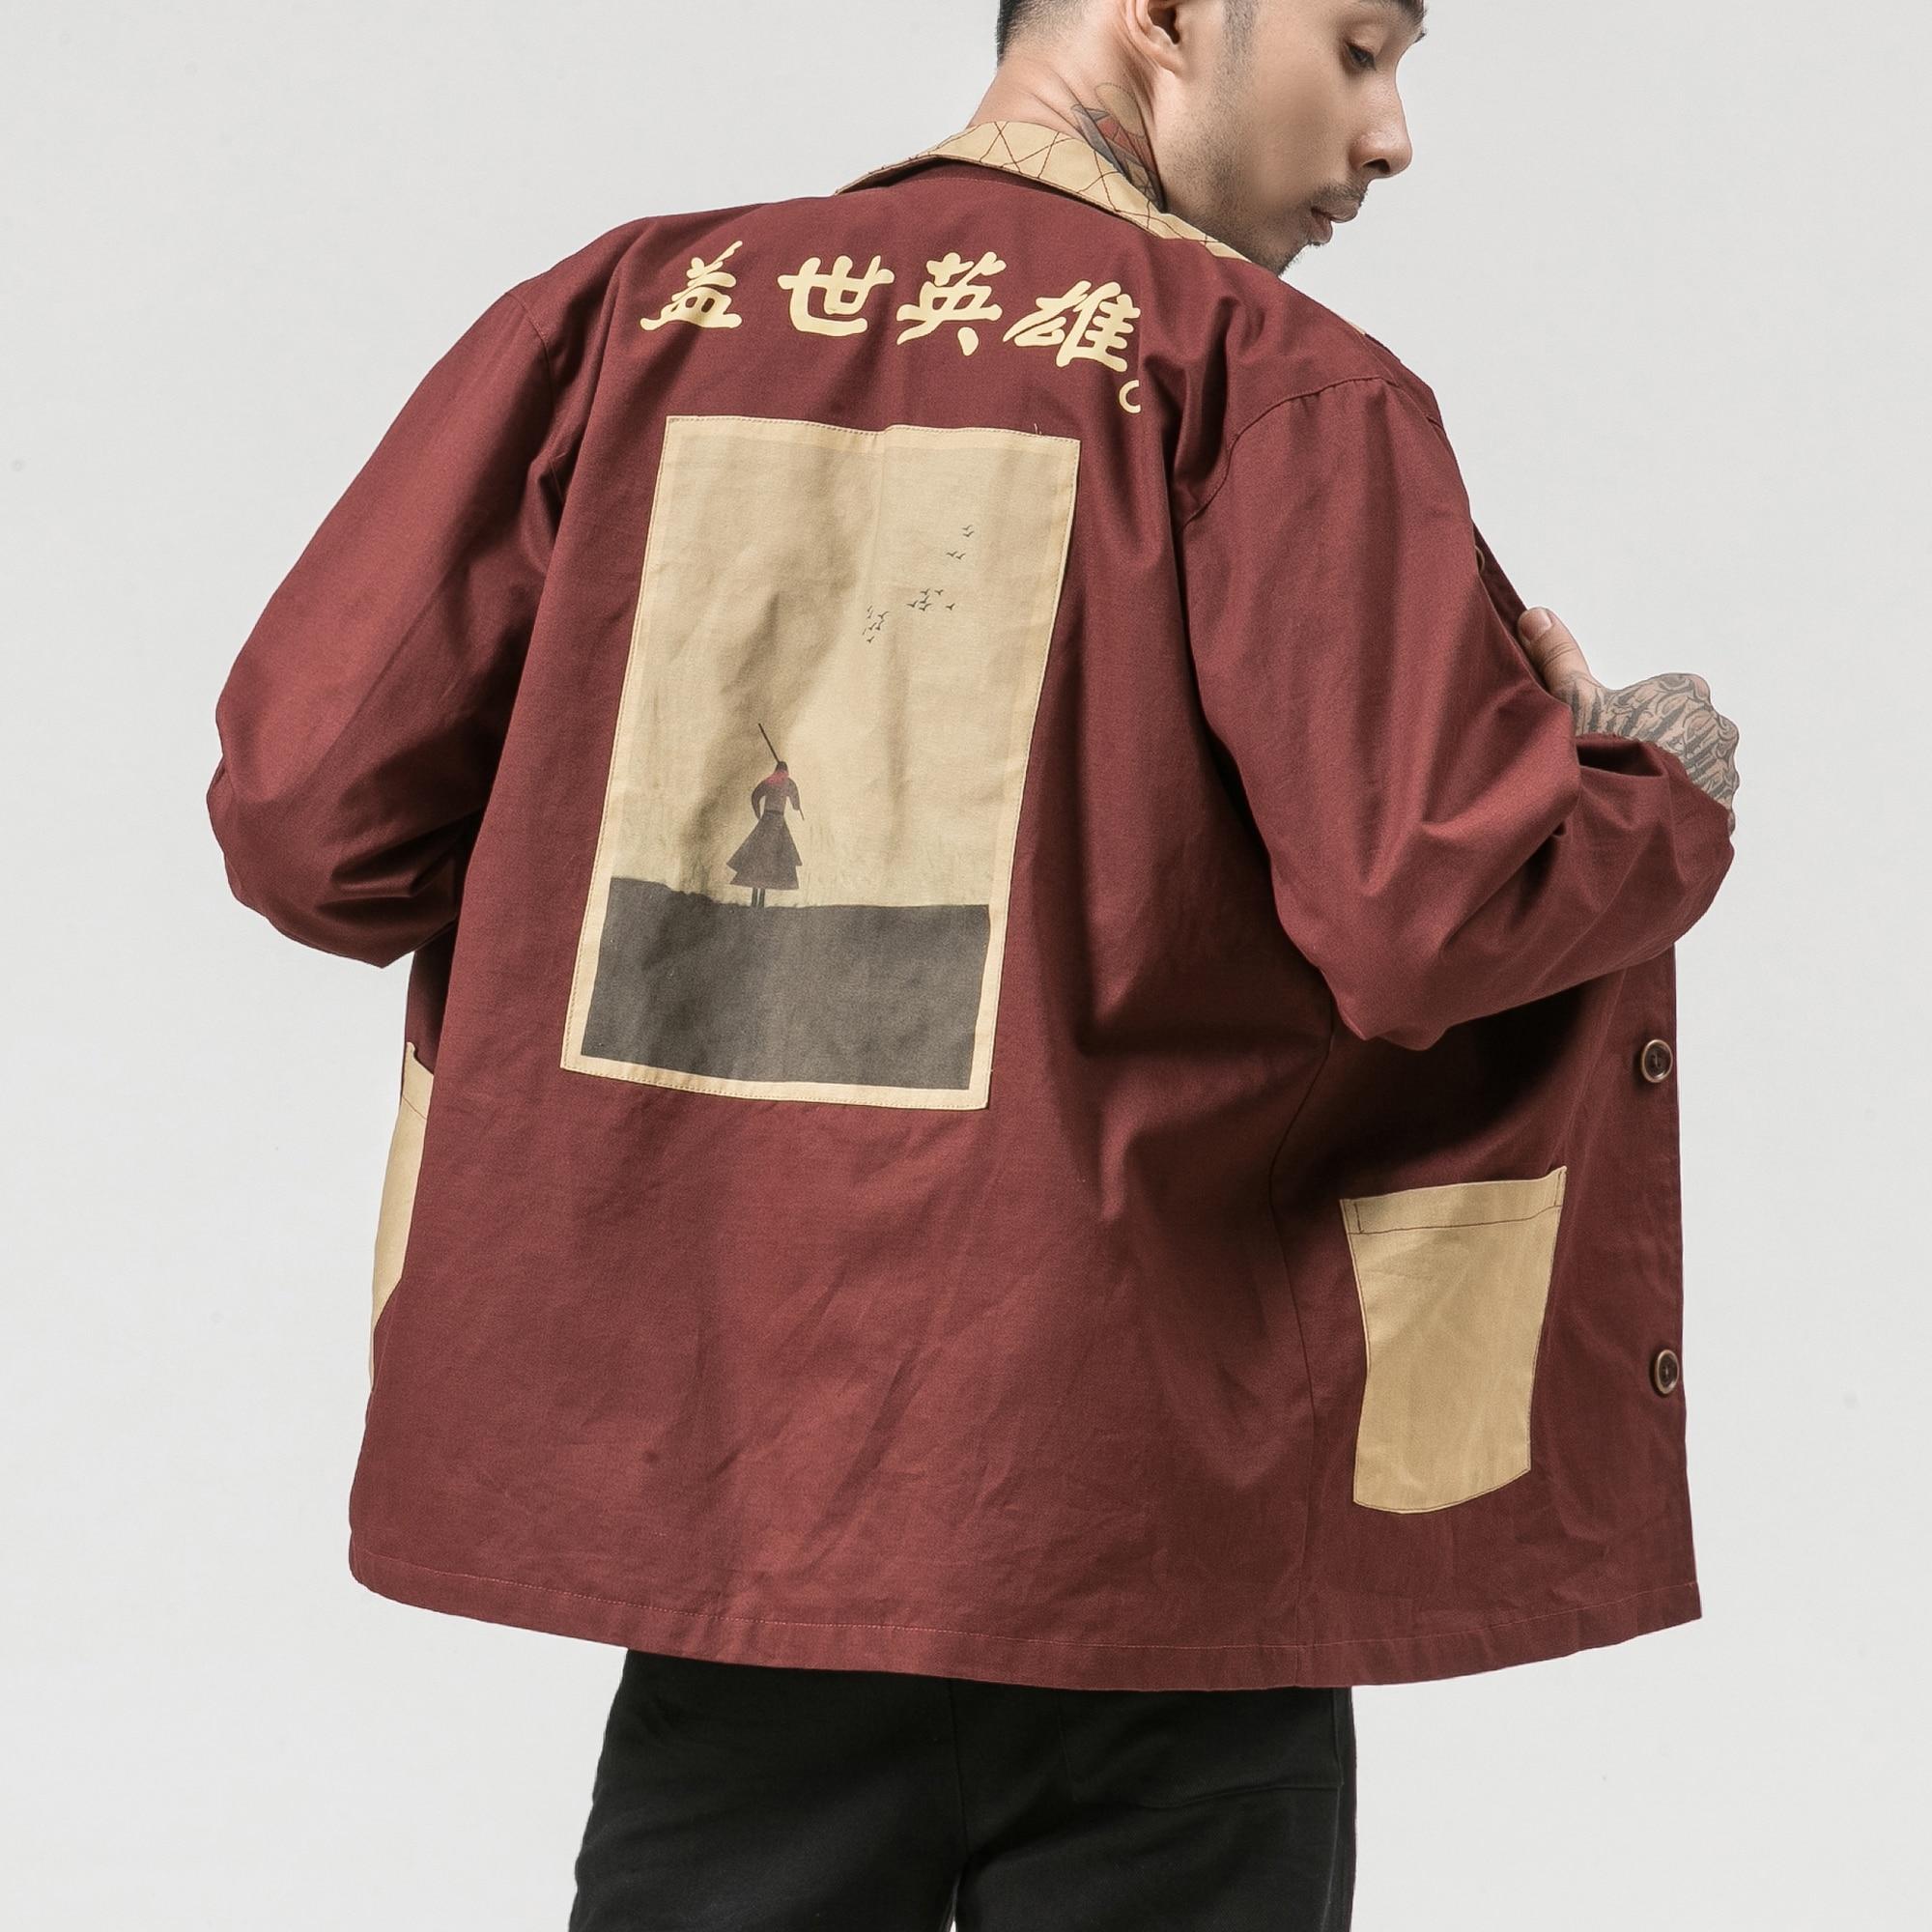 Windbreaker Men's Long Sleeve Section Print Personality Pocket Shirt Autumn Loose Retro Chinese Style Men's Chinese Jacket